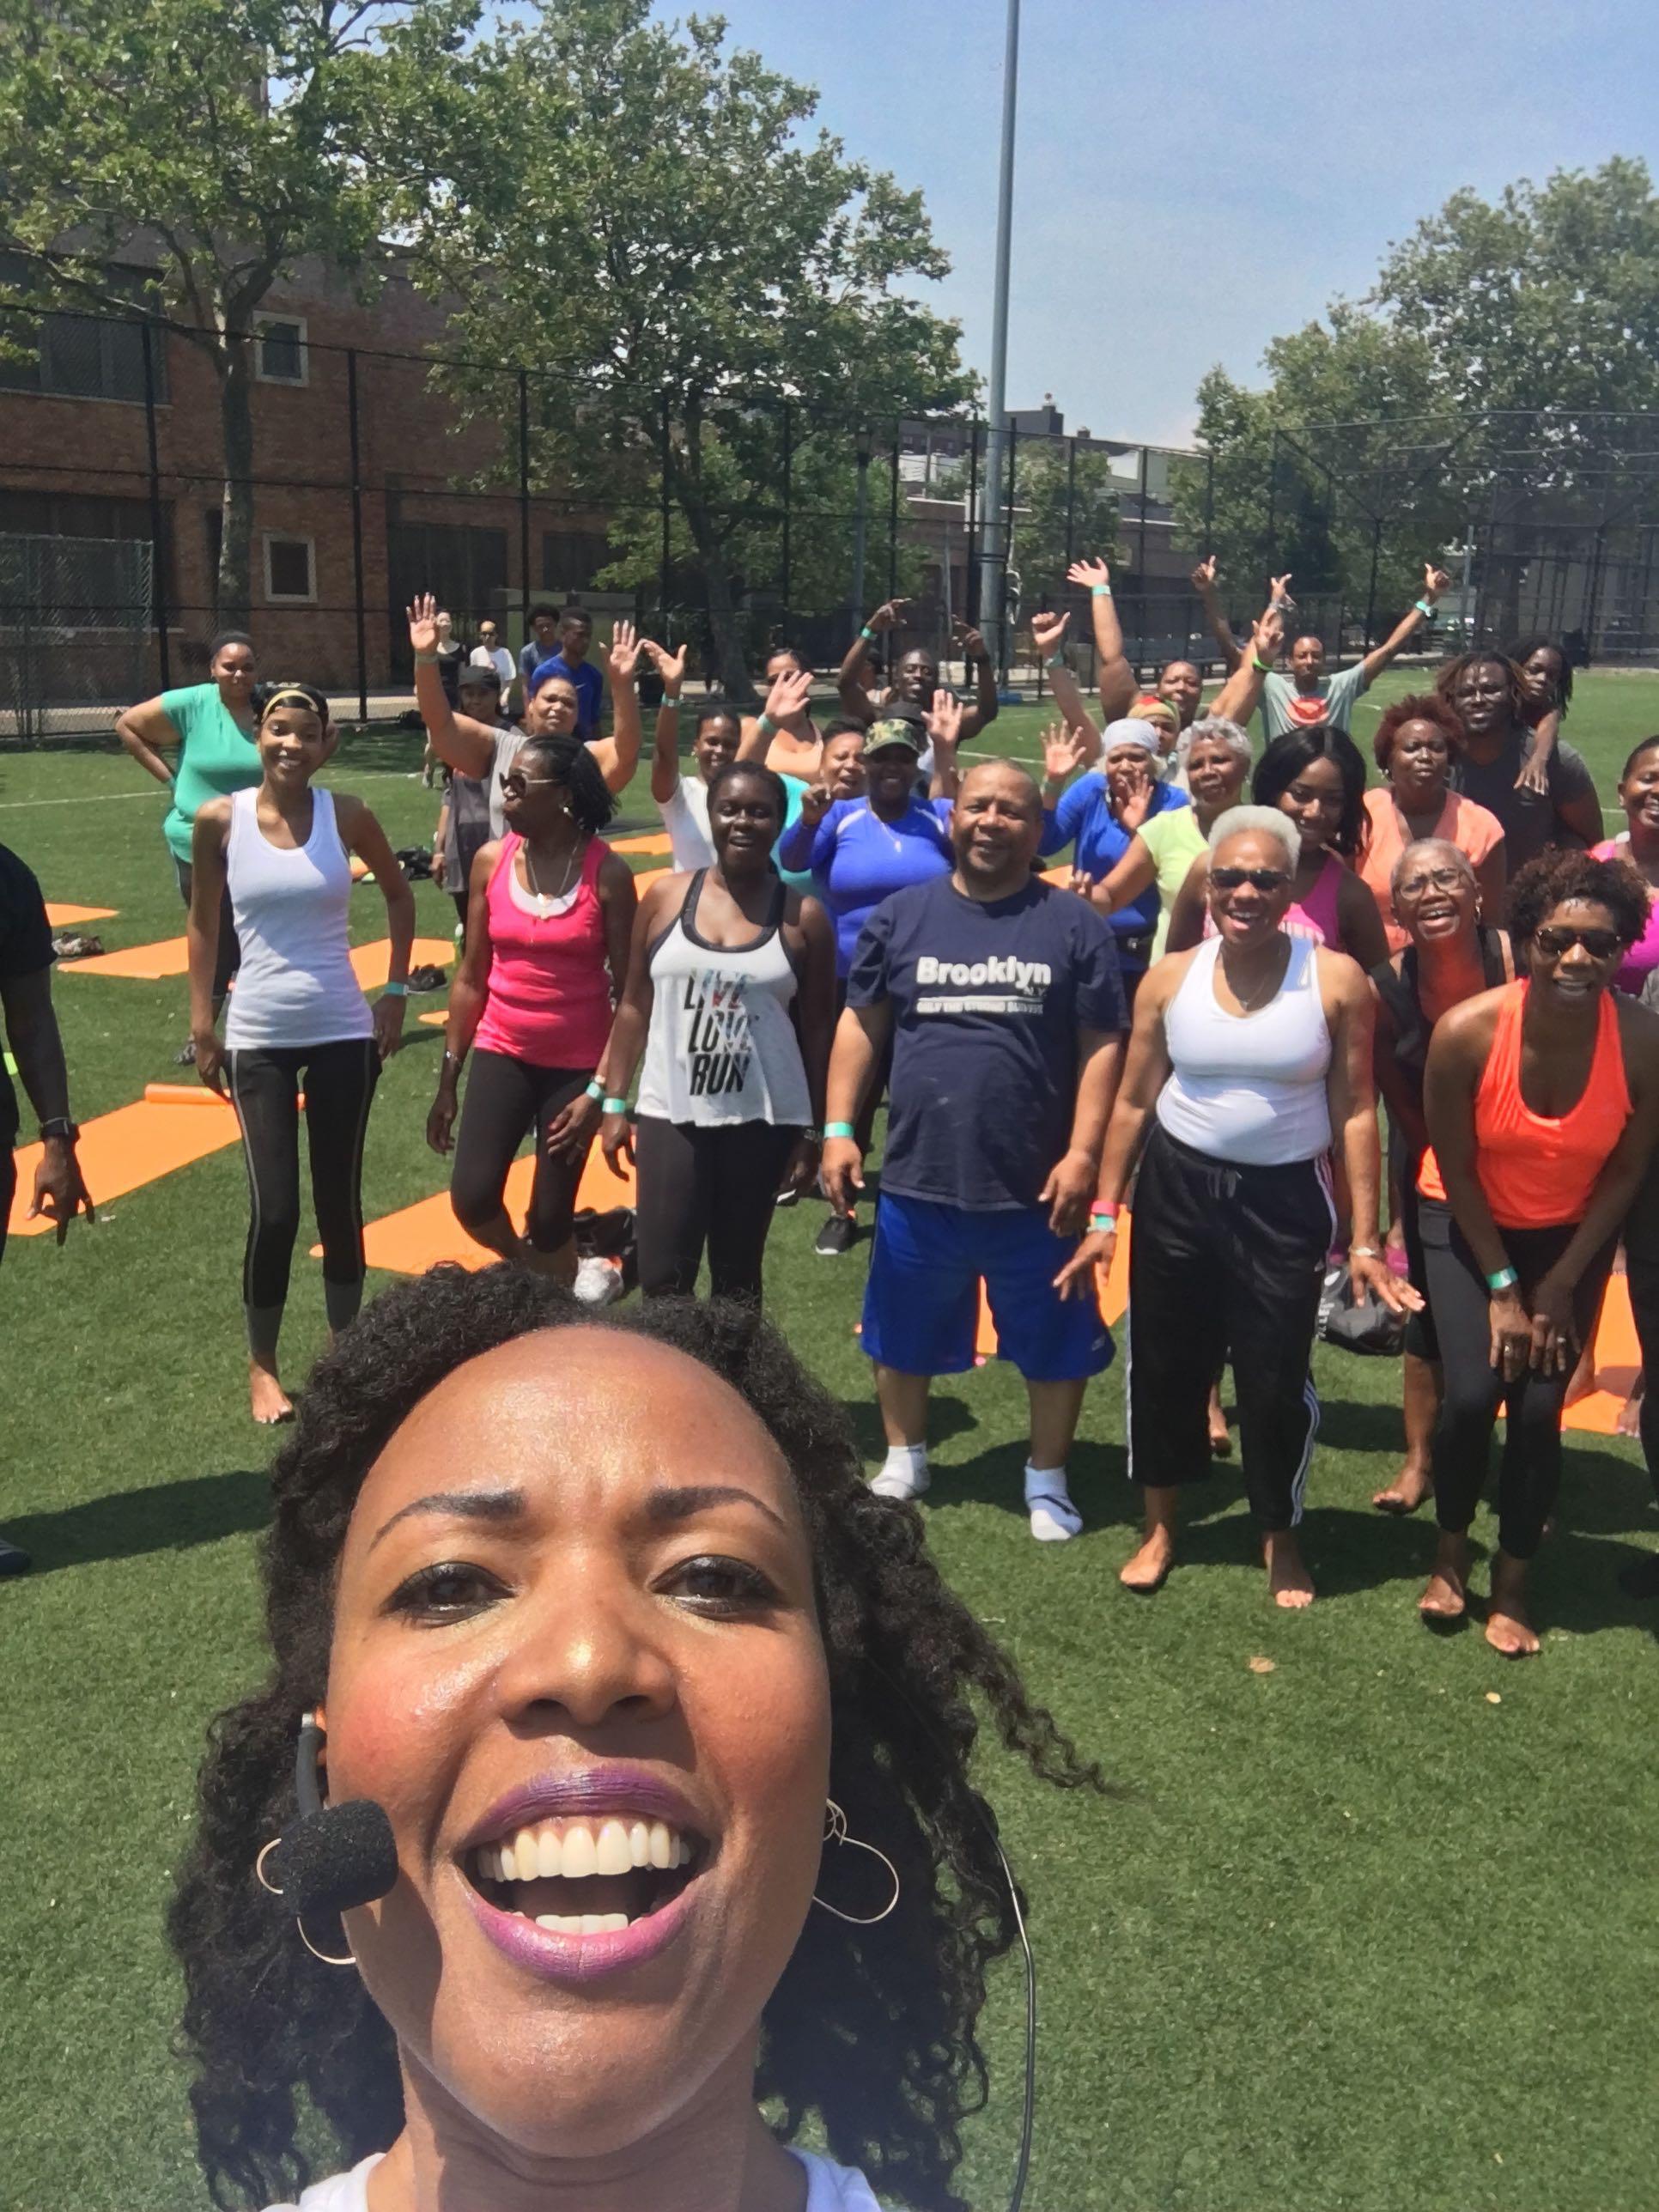 Taking a break for our selfie-video - Breathe Brownsville Brooklyn Yoga Festival